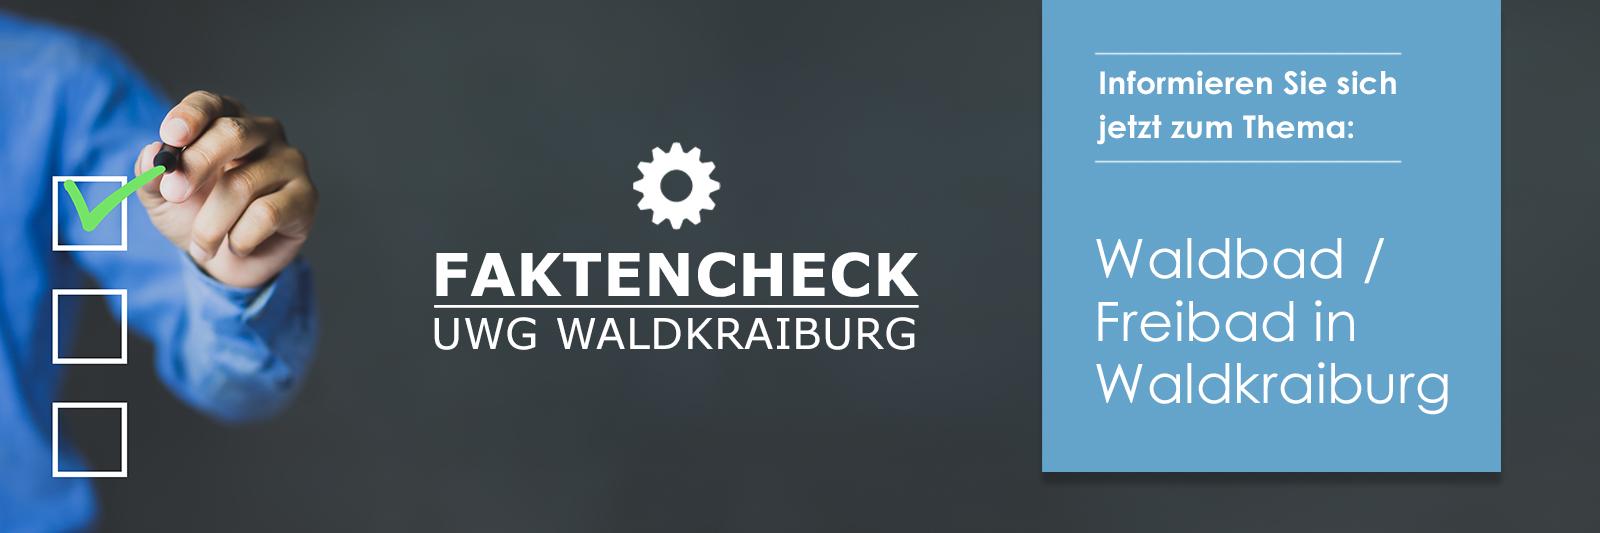 UWG Faktencheck Waldbad / Freibad in Waldkraiburg